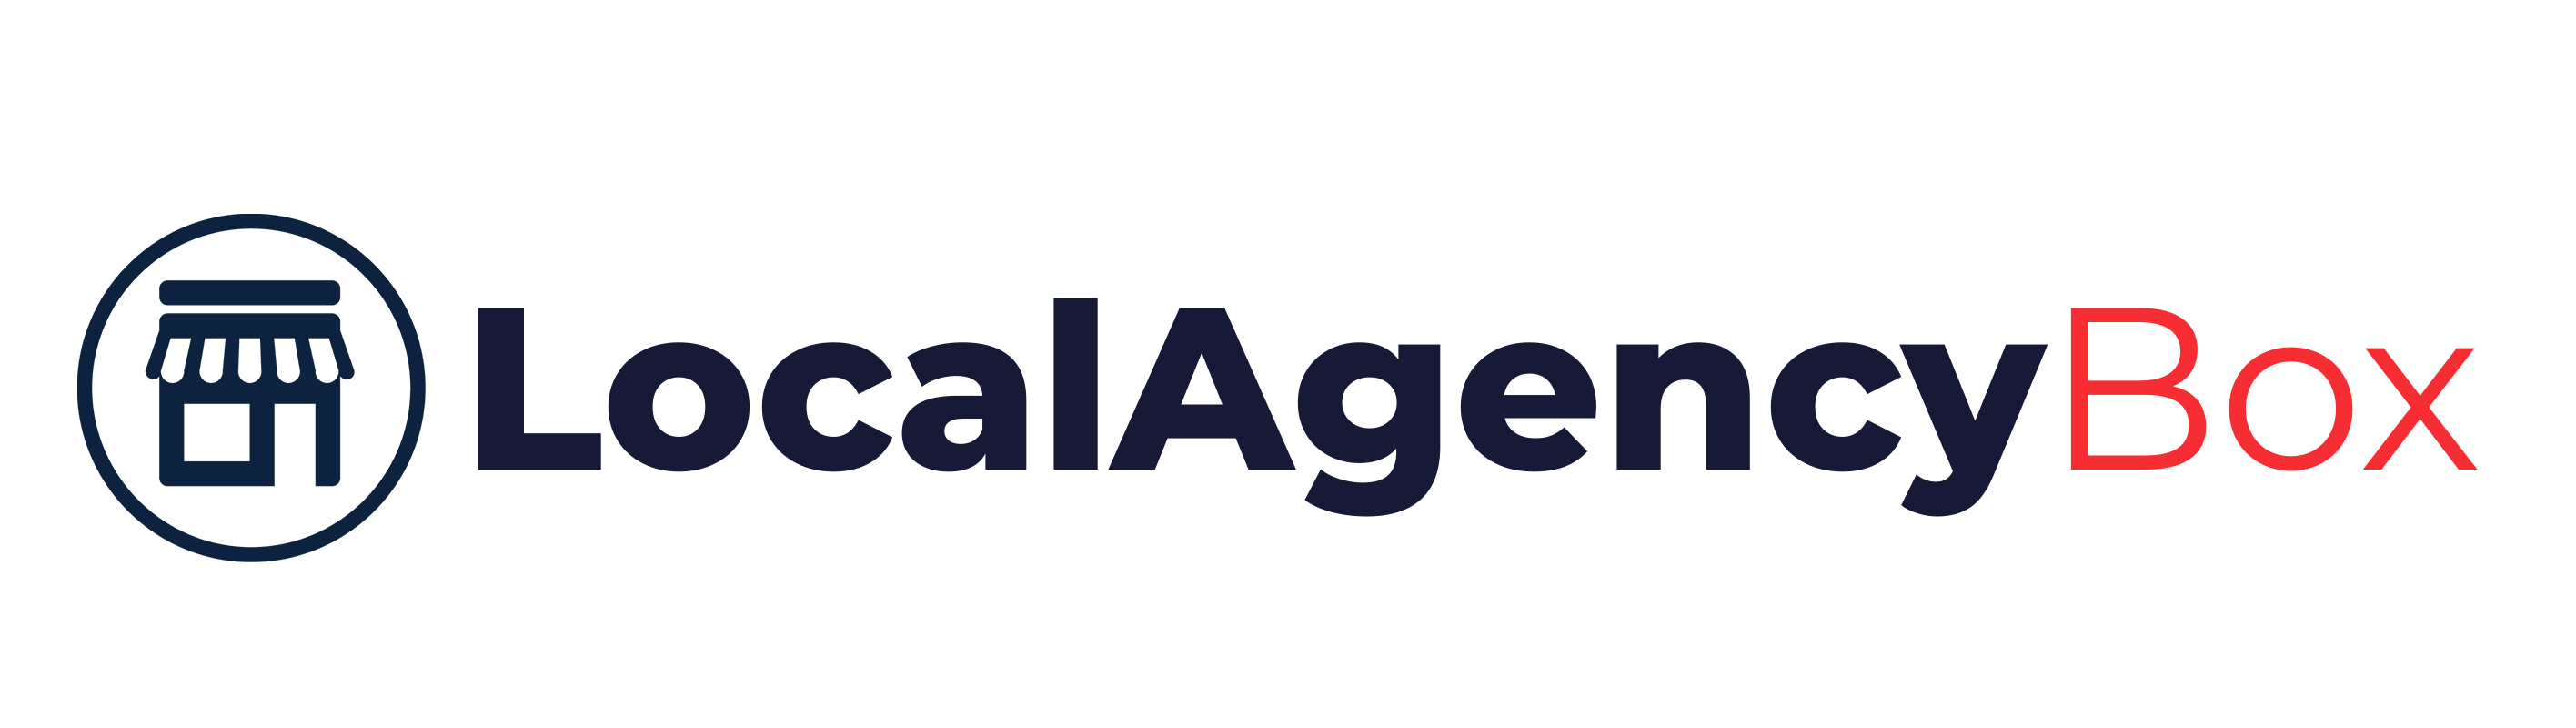 Local Agency Box Info